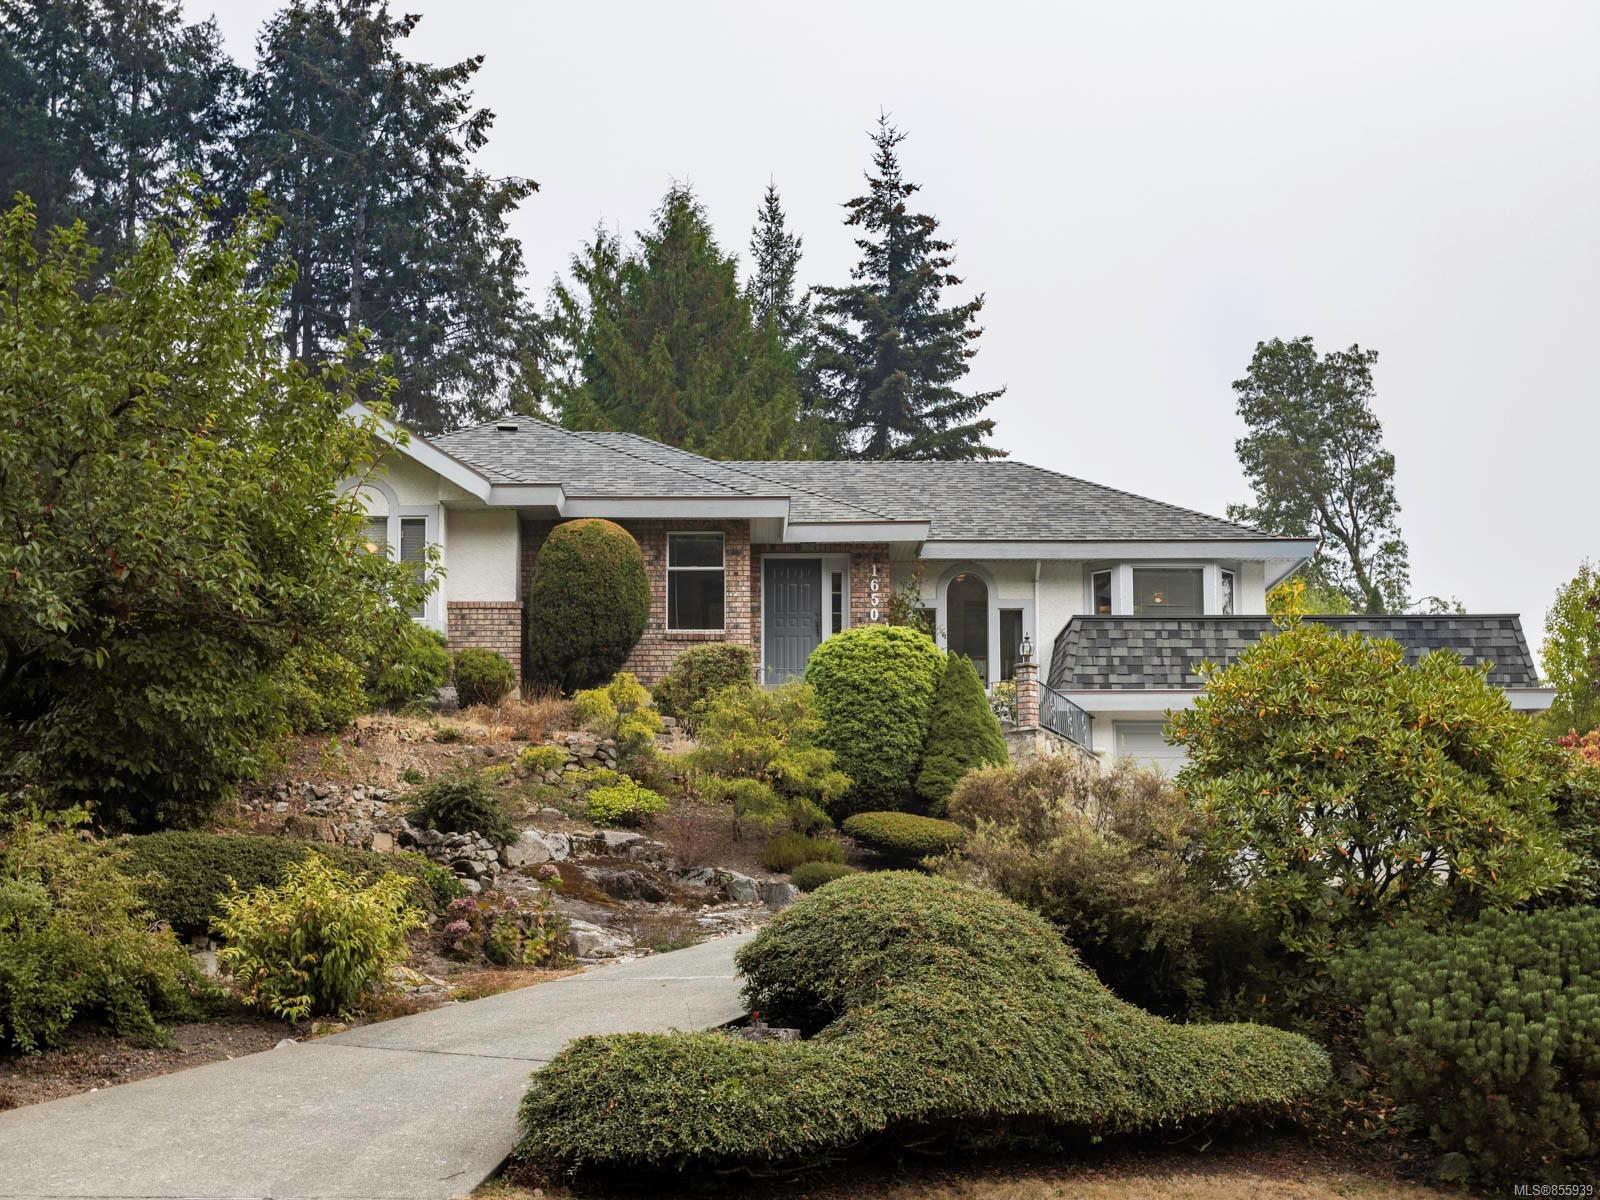 Main Photo: 1650 Barrett Dr in : NS Dean Park House for sale (North Saanich)  : MLS®# 855939